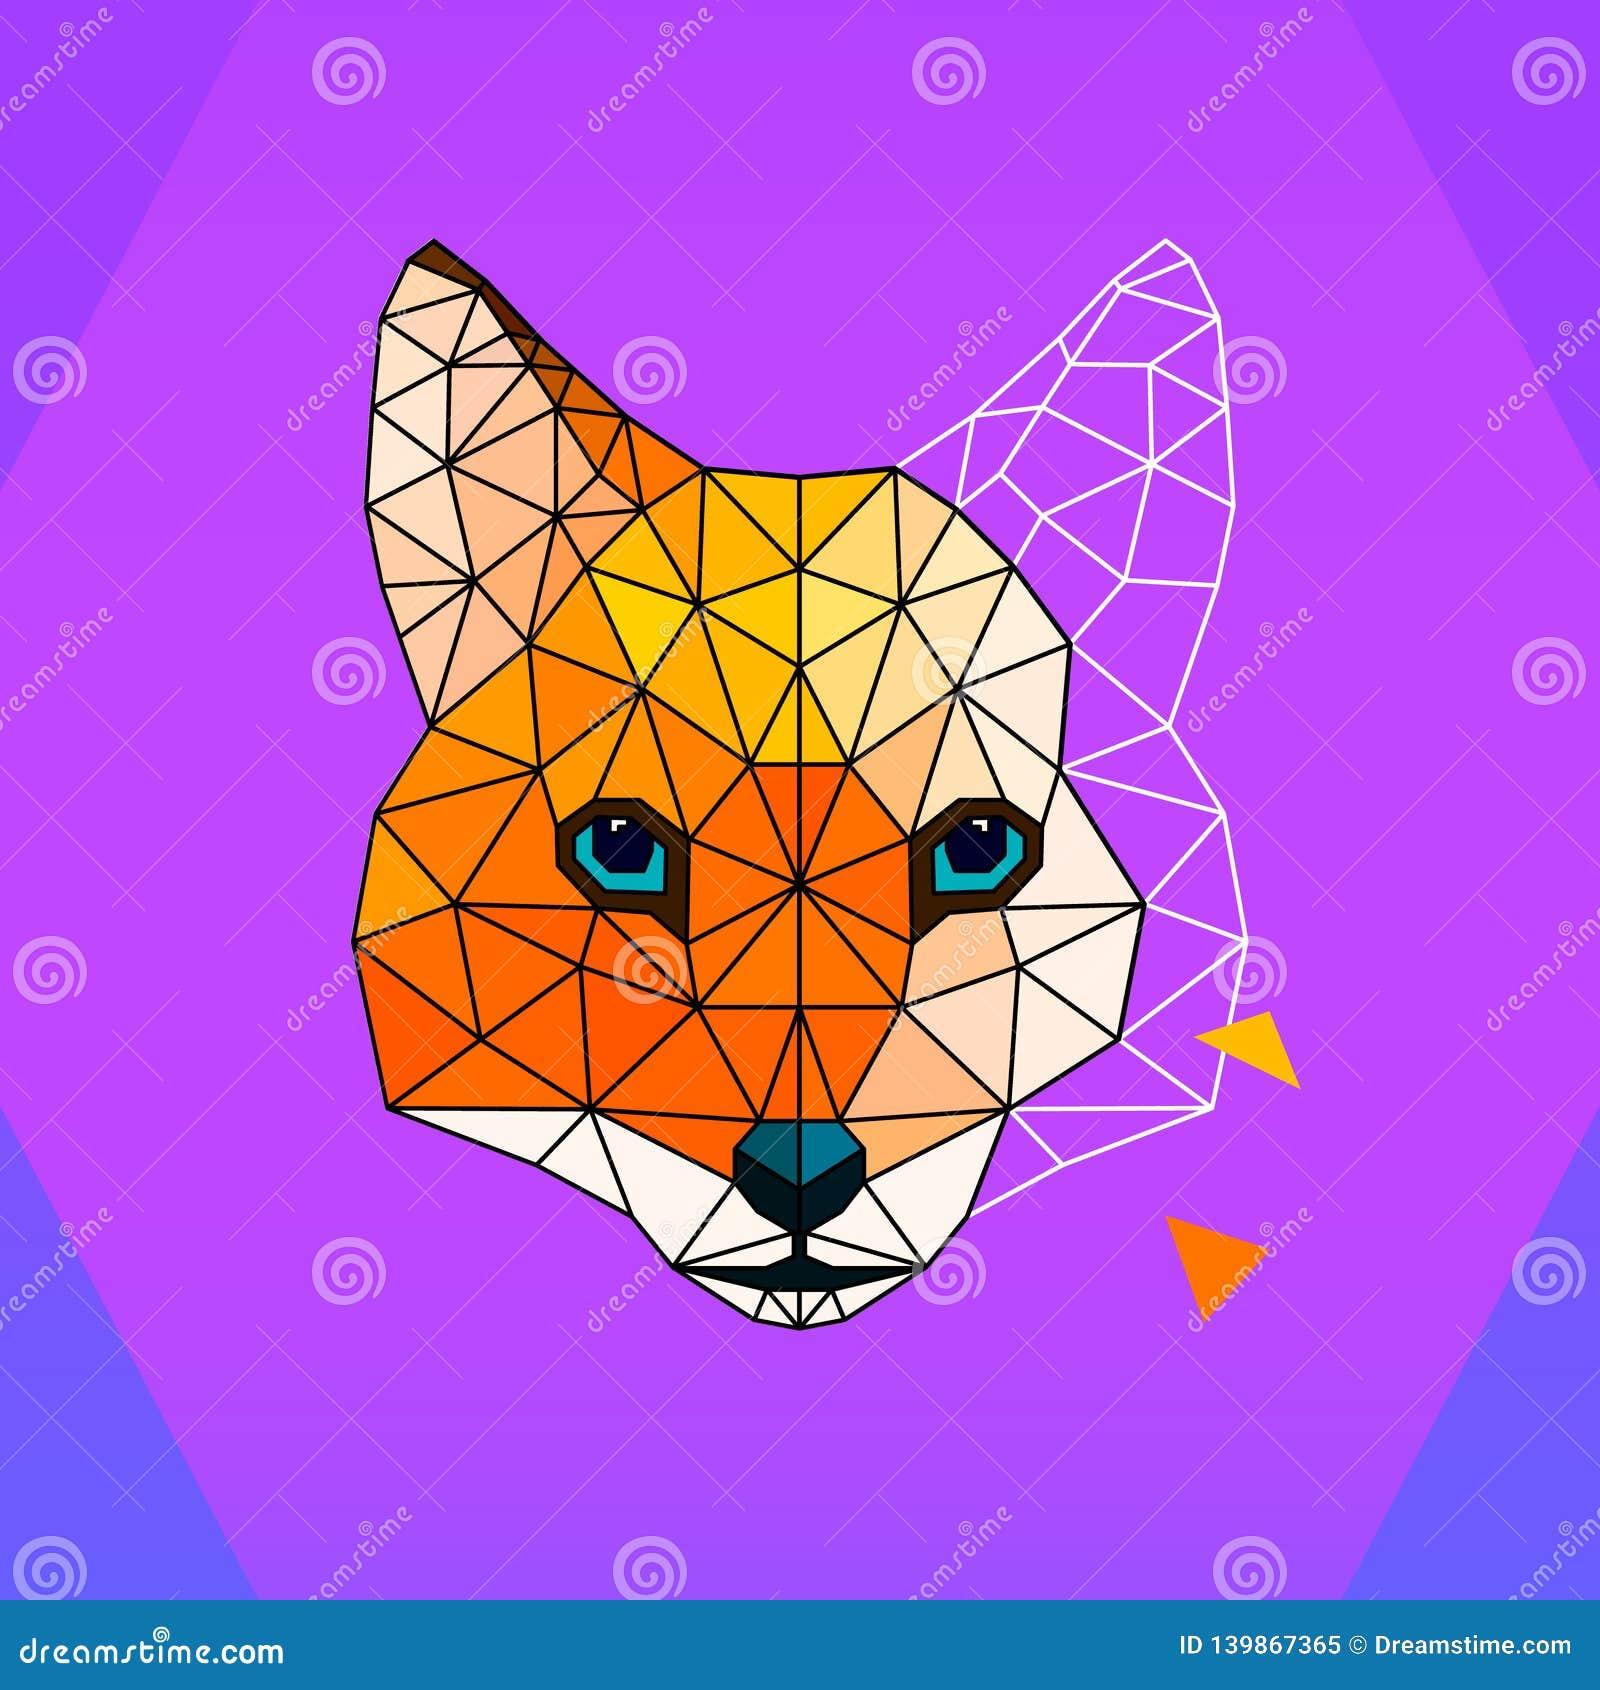 Fox polygon logo / icon. Art illustration